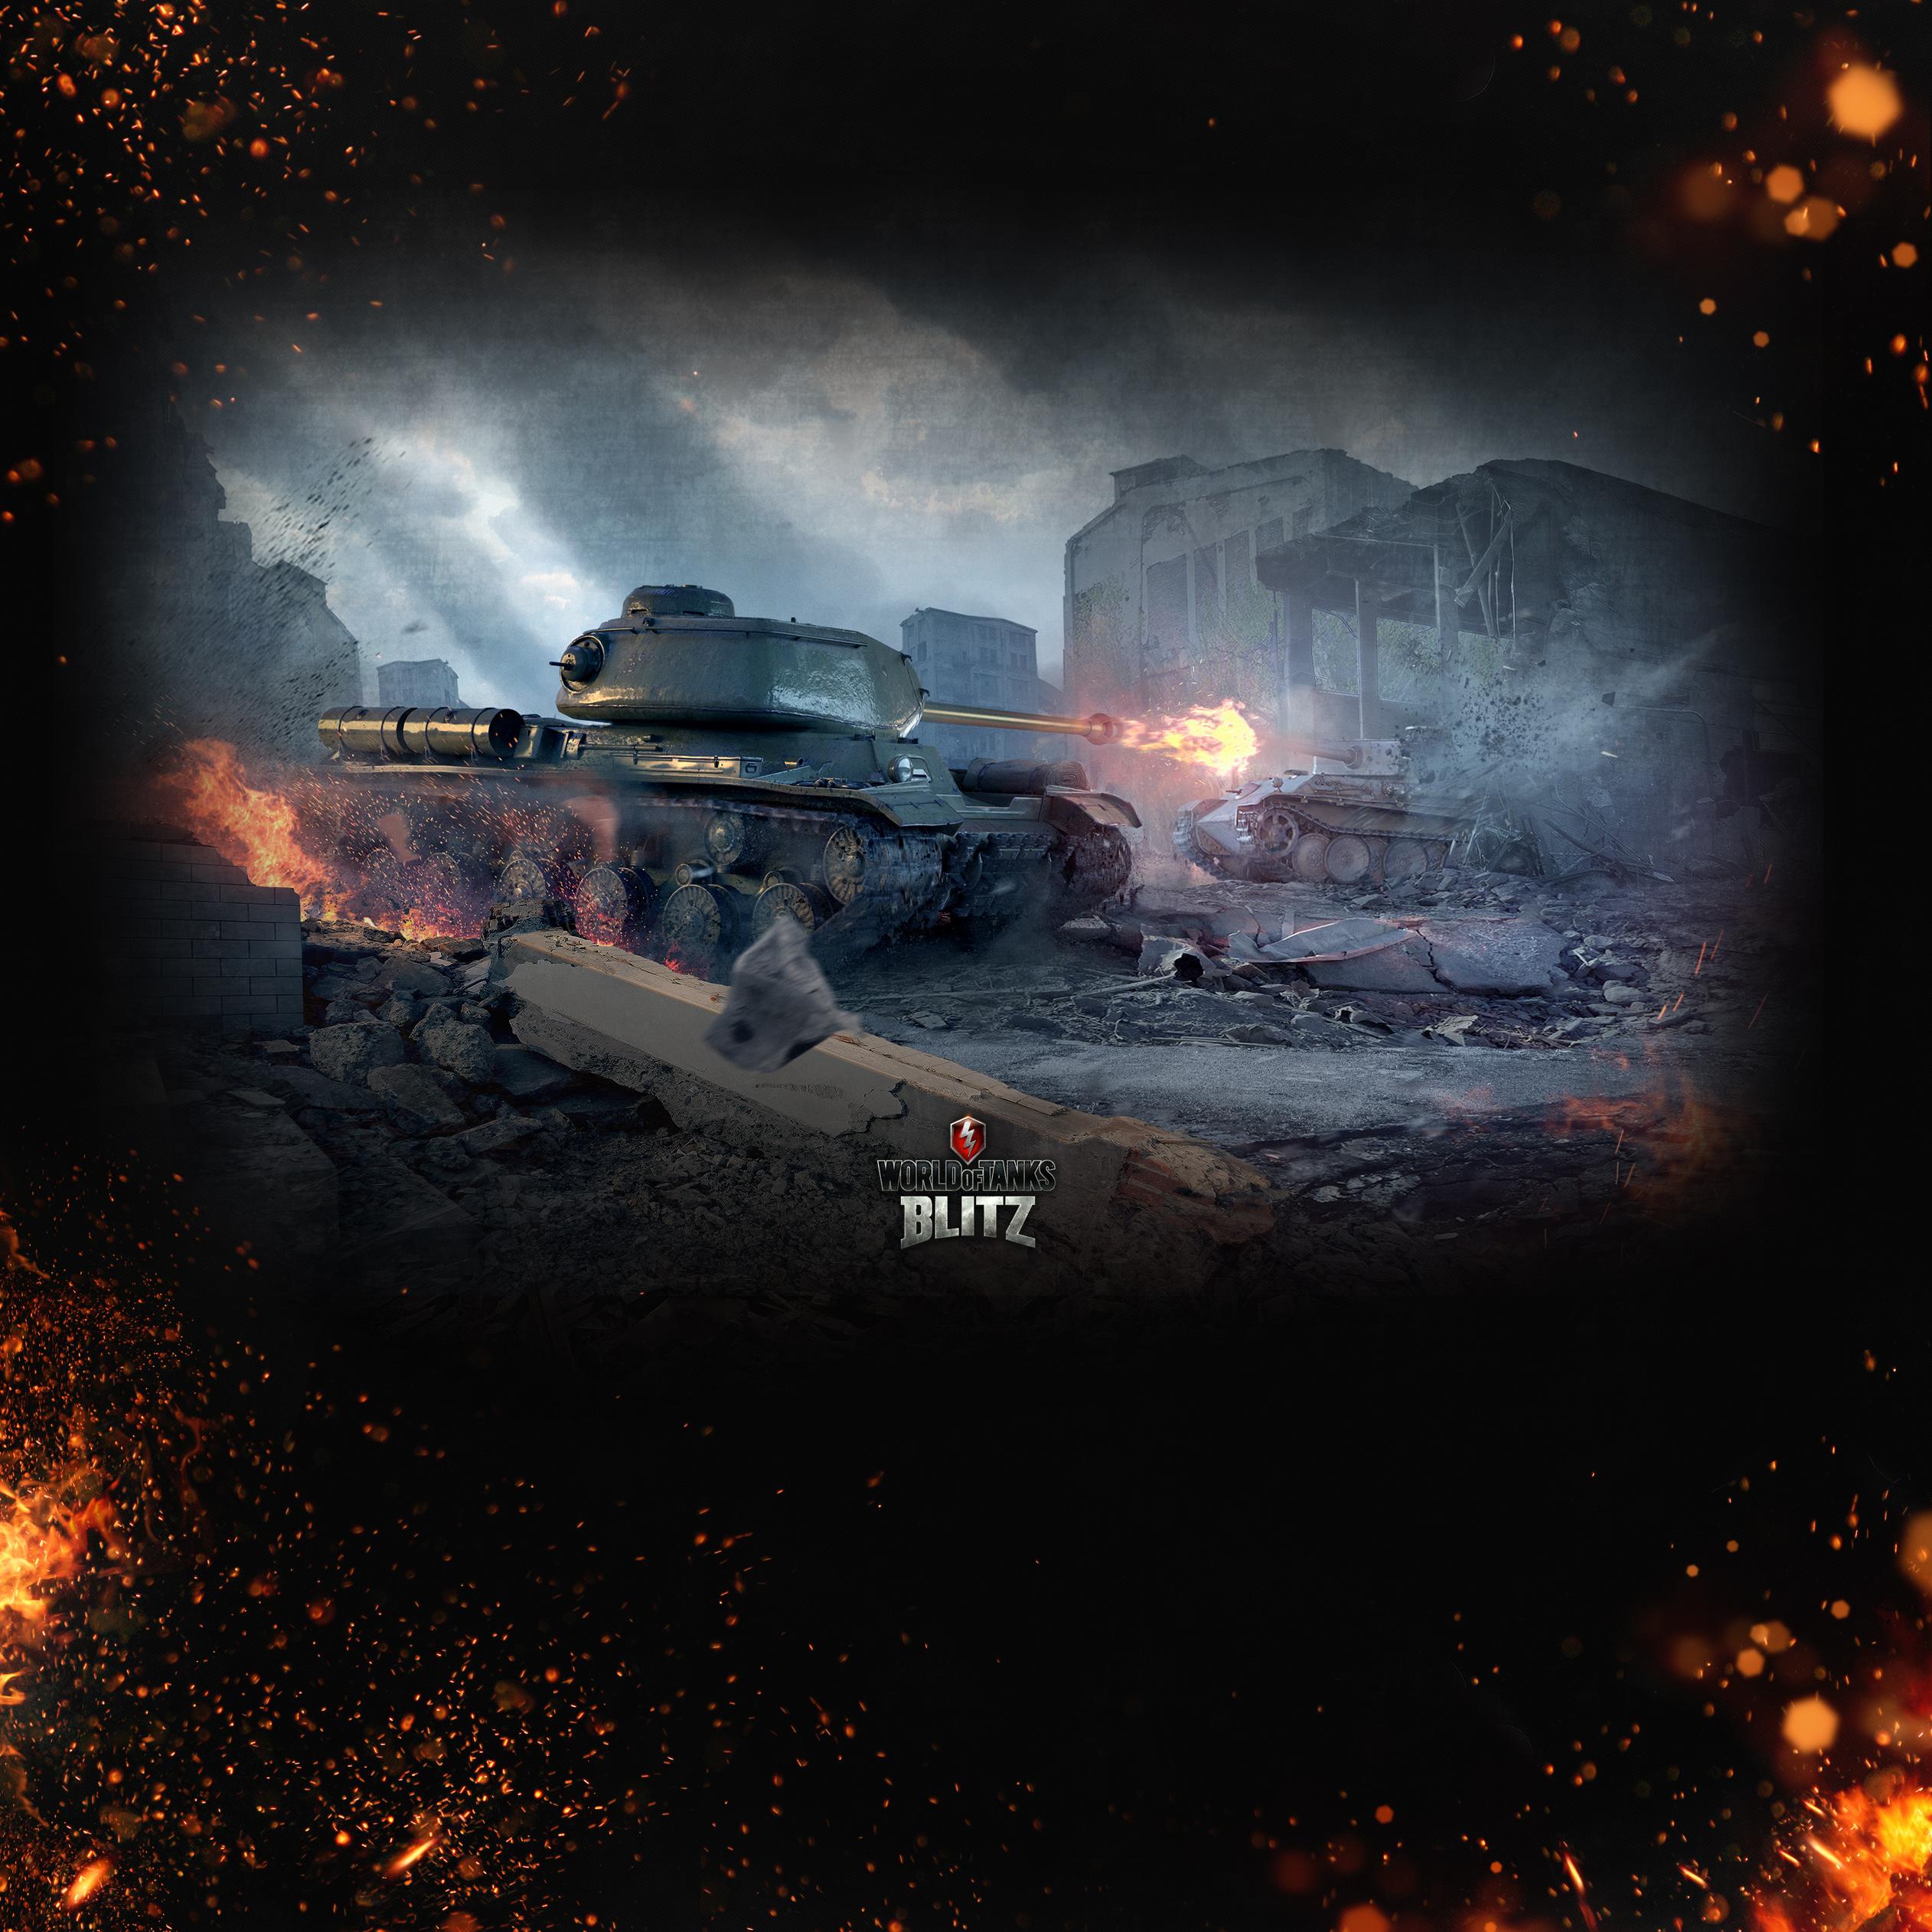 world of tanks blitz скачать моды айфон